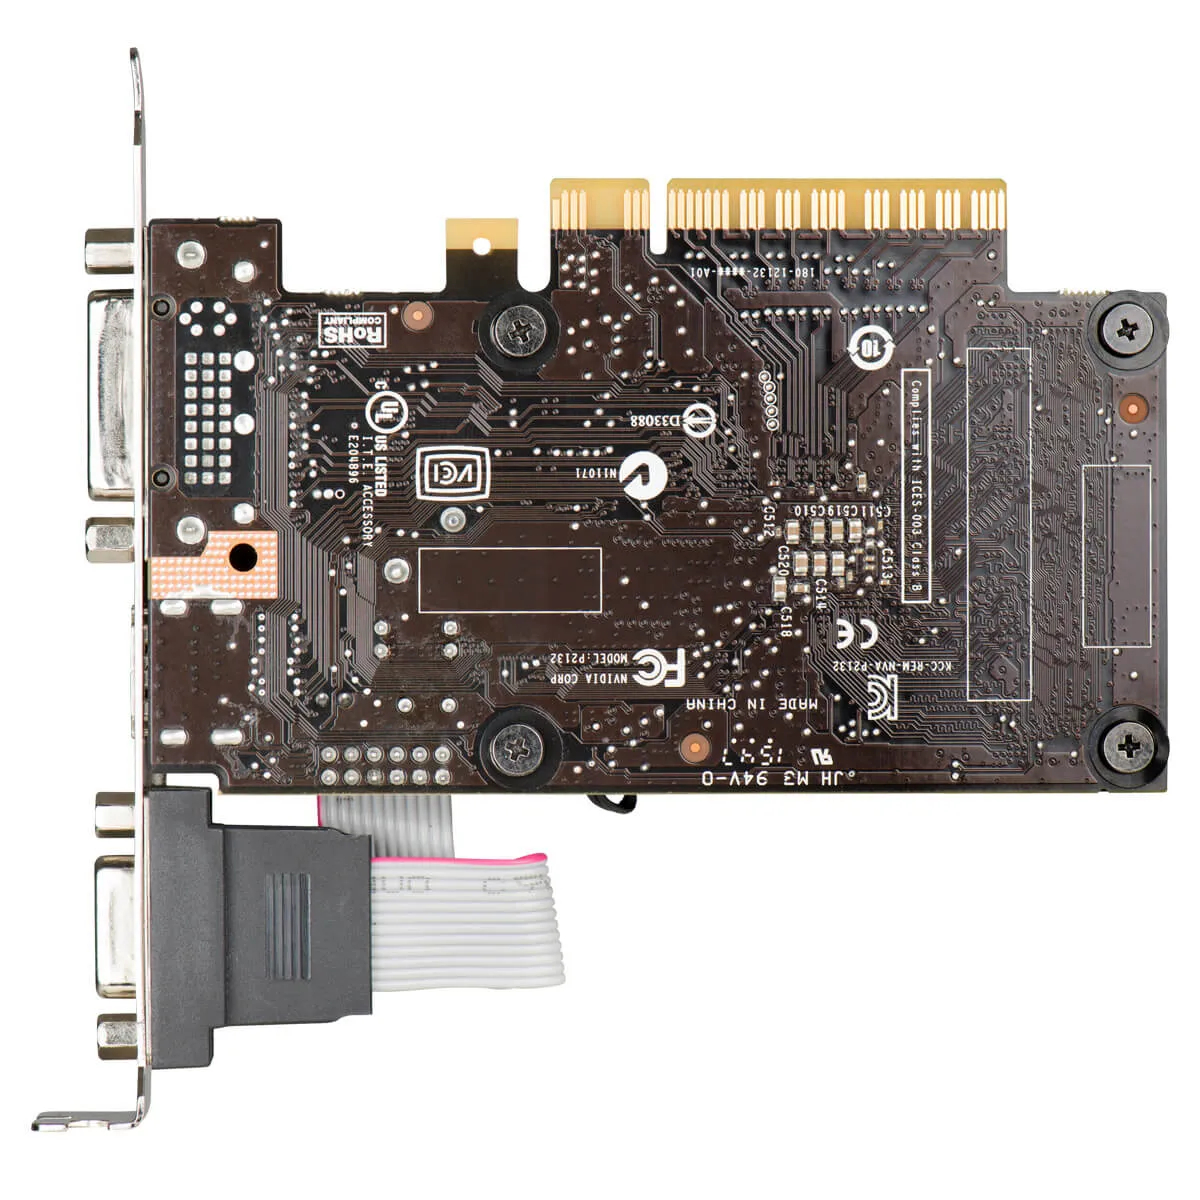 Placa de Vídeo EVGA GeForce GT 710 2GB DDR3 Low Profile 02G-P3-2713-KR